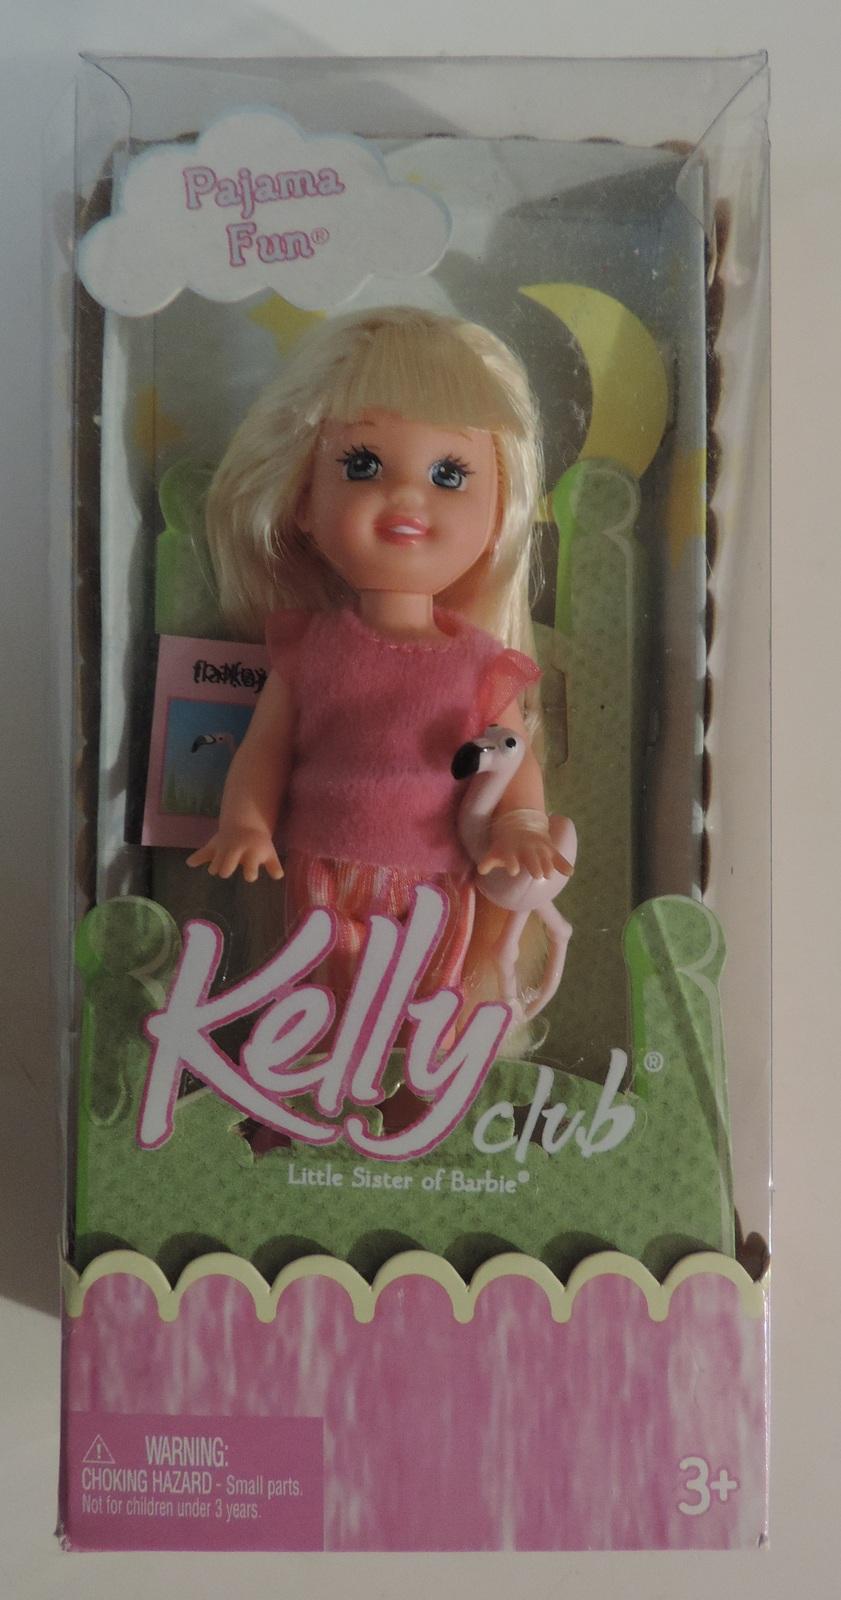 Barbie Pajama Fun Kelly club doll ( Monster High Bratz Liv ) - New Mattel